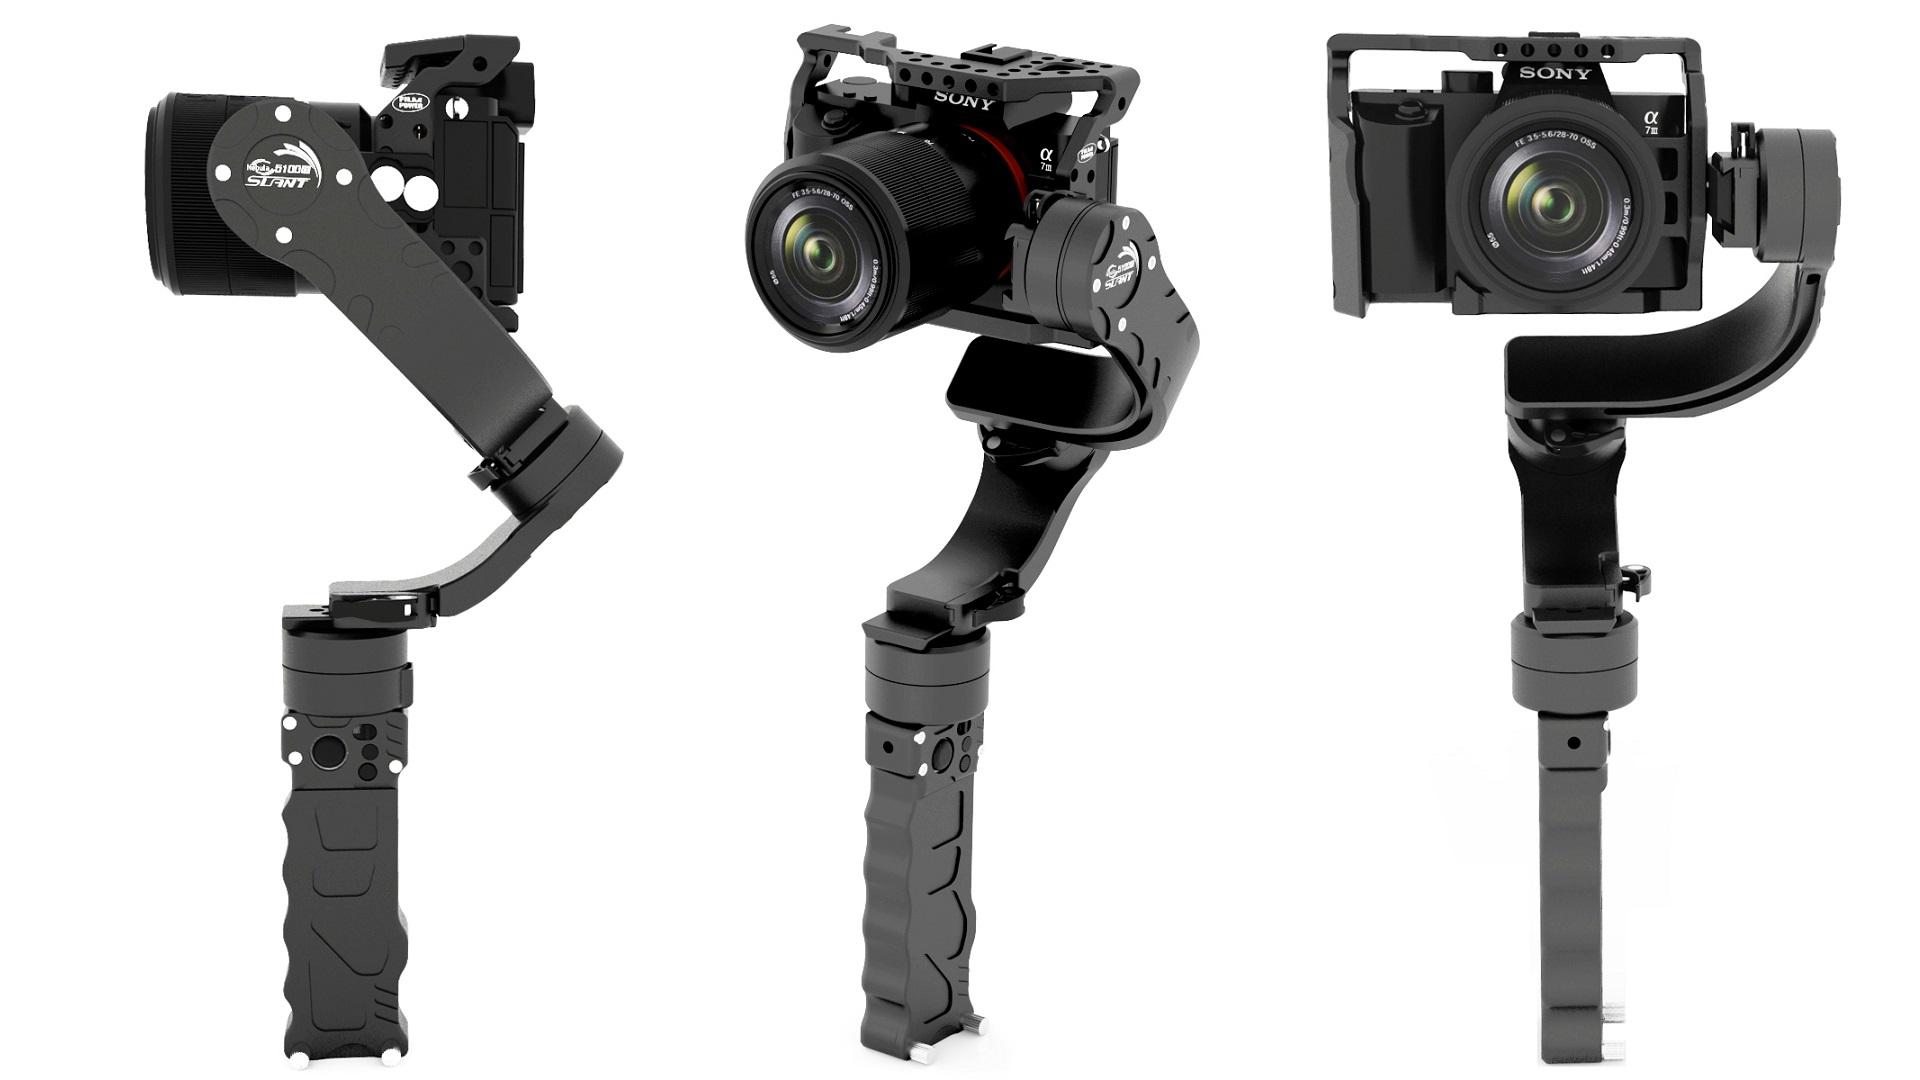 FilmpowerがNebula 5100 a7 Slantを発表 - α7シリーズ用ジンバル